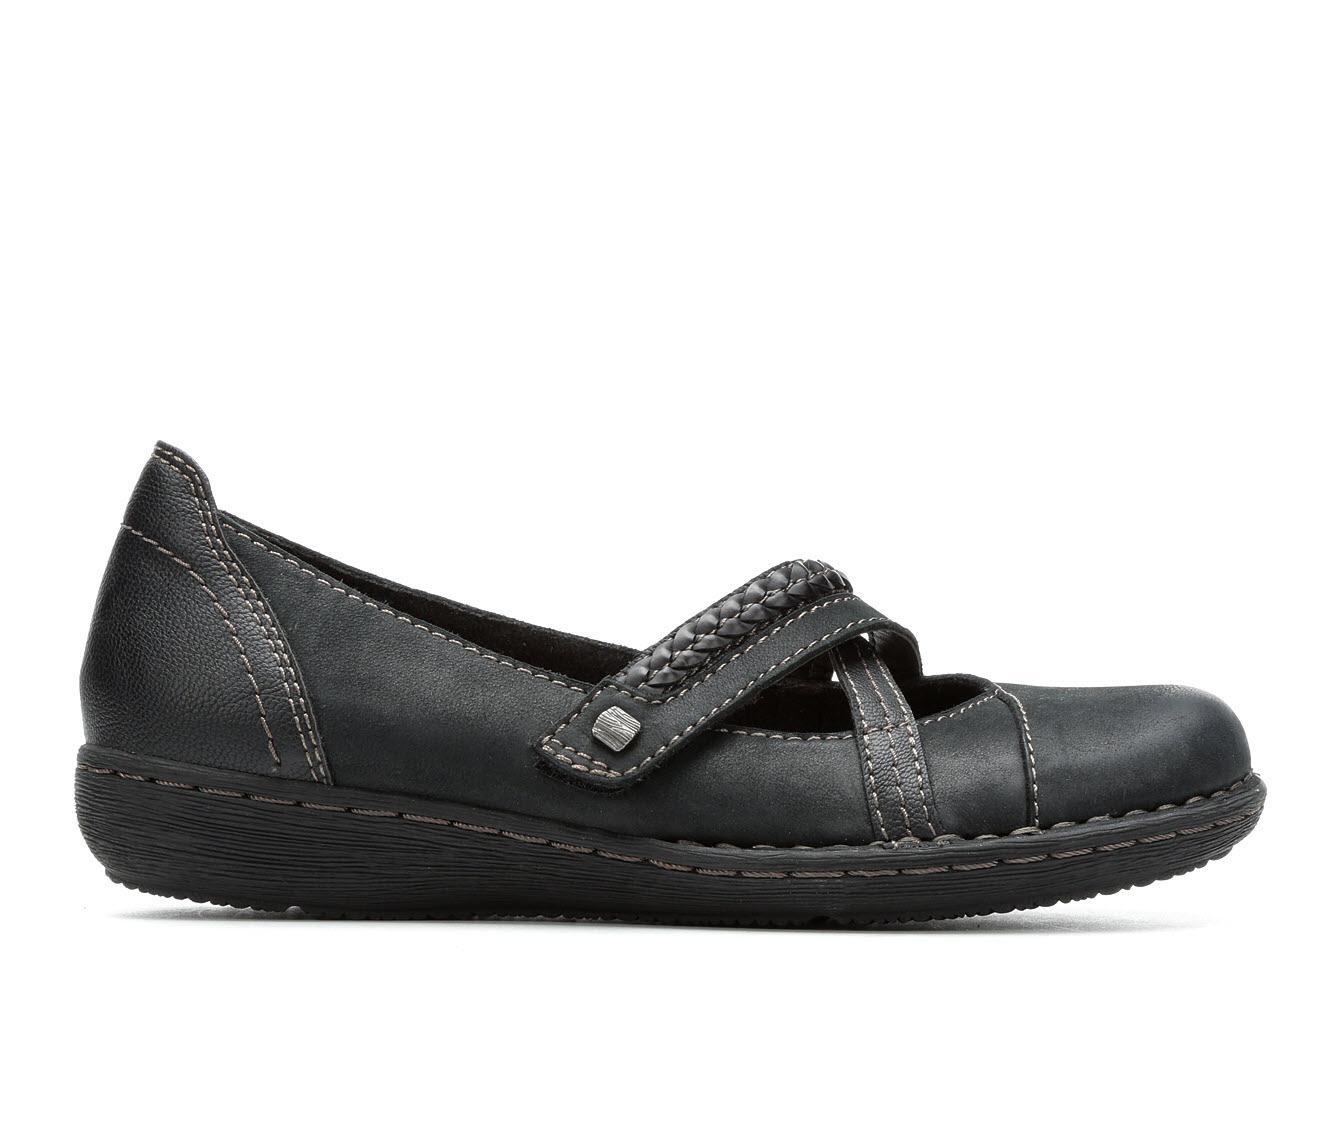 Earth Origins Toriana Women's Shoe (Black Leather)